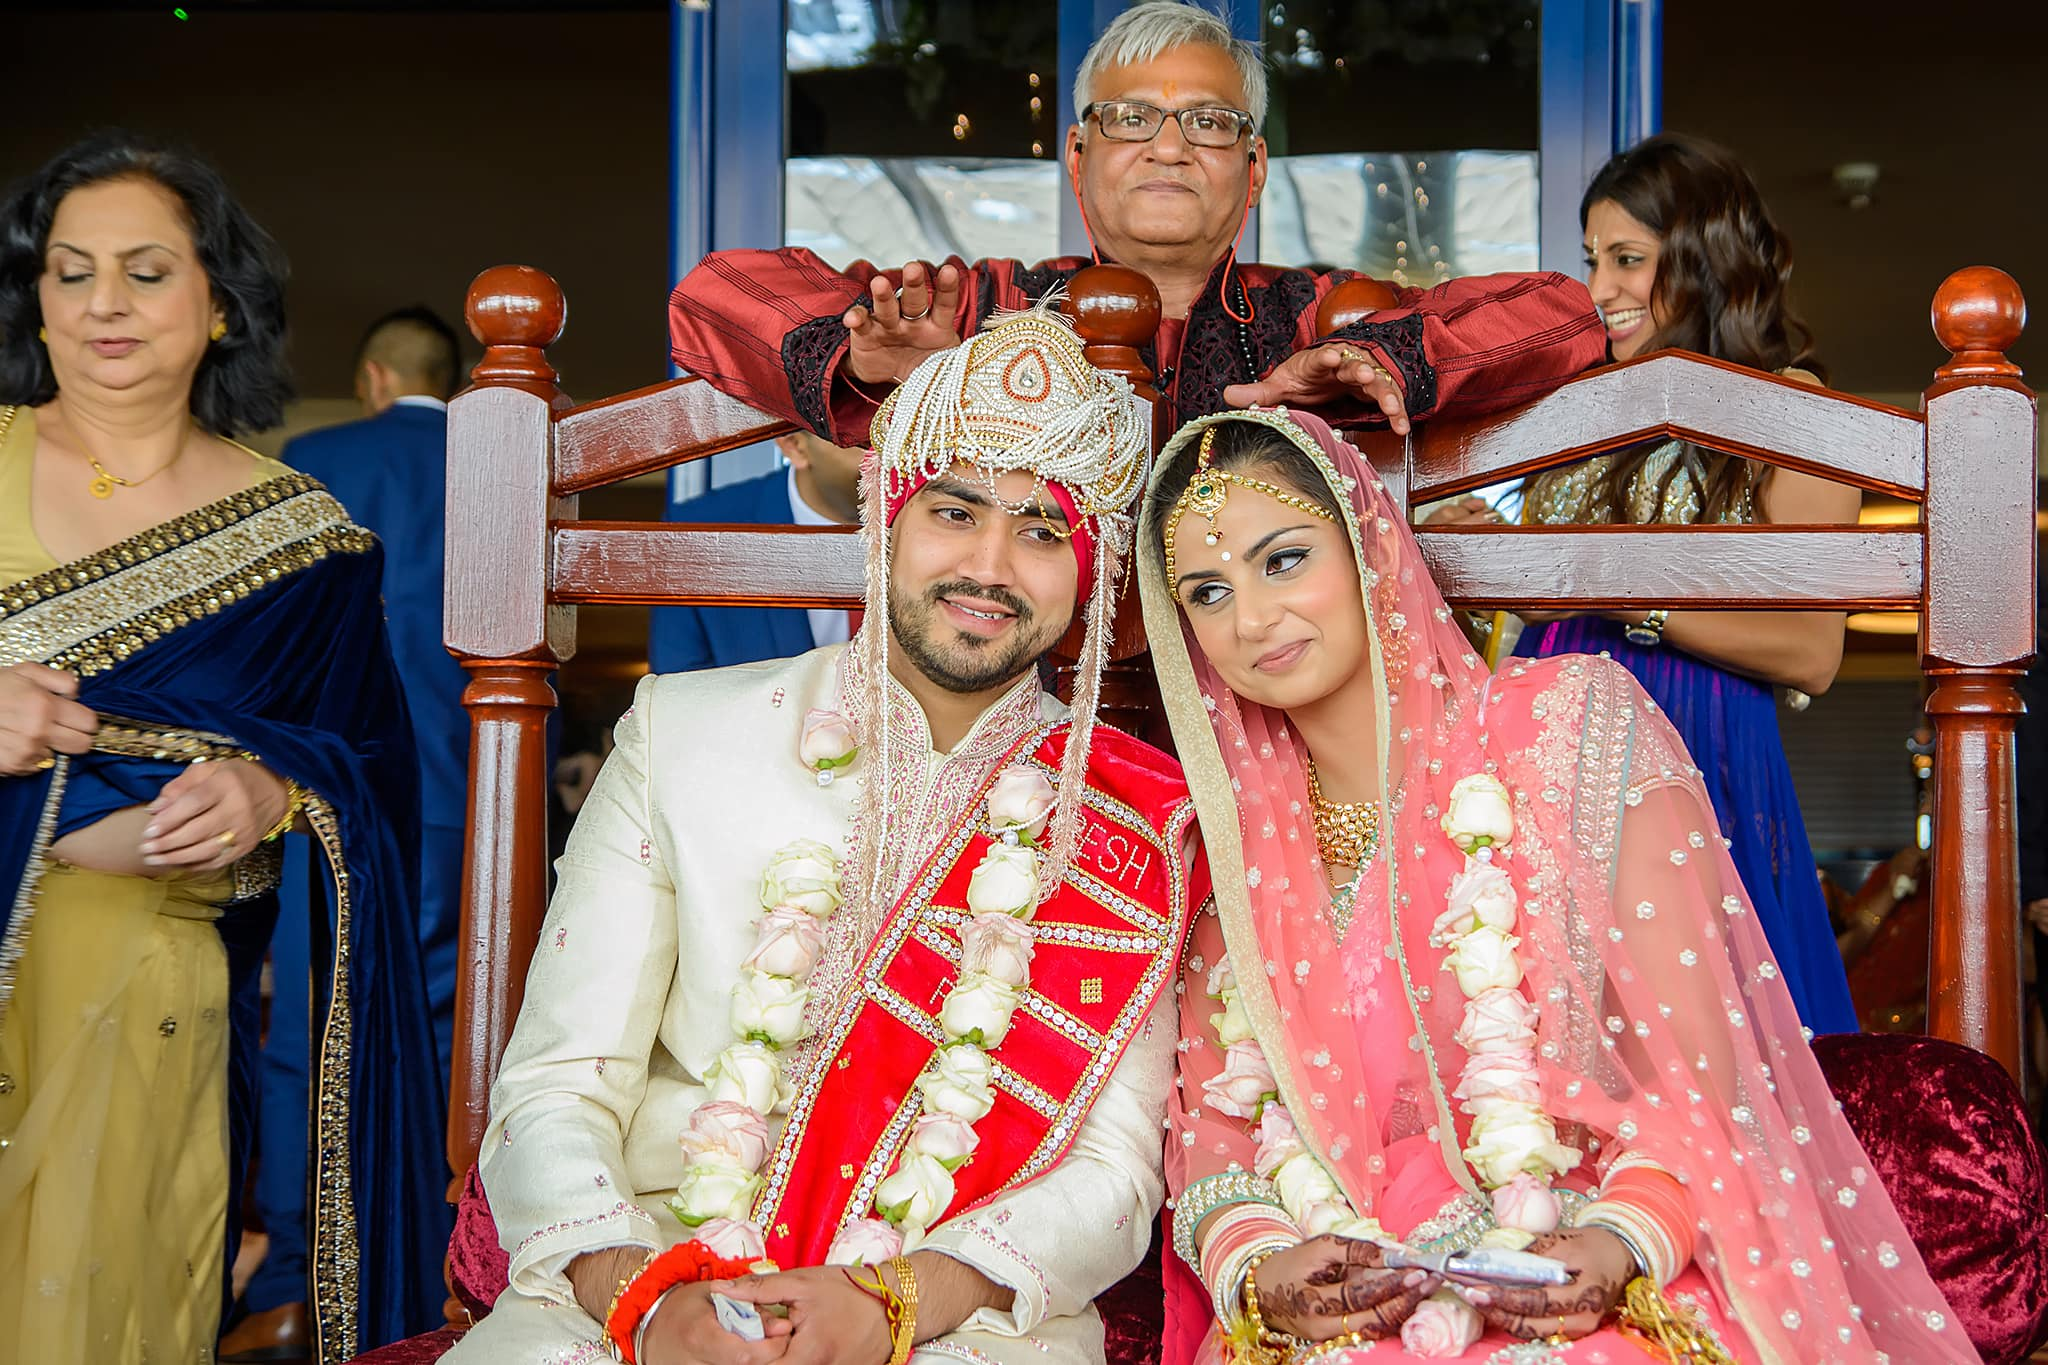 Hindu hertfordshire wedding photographer